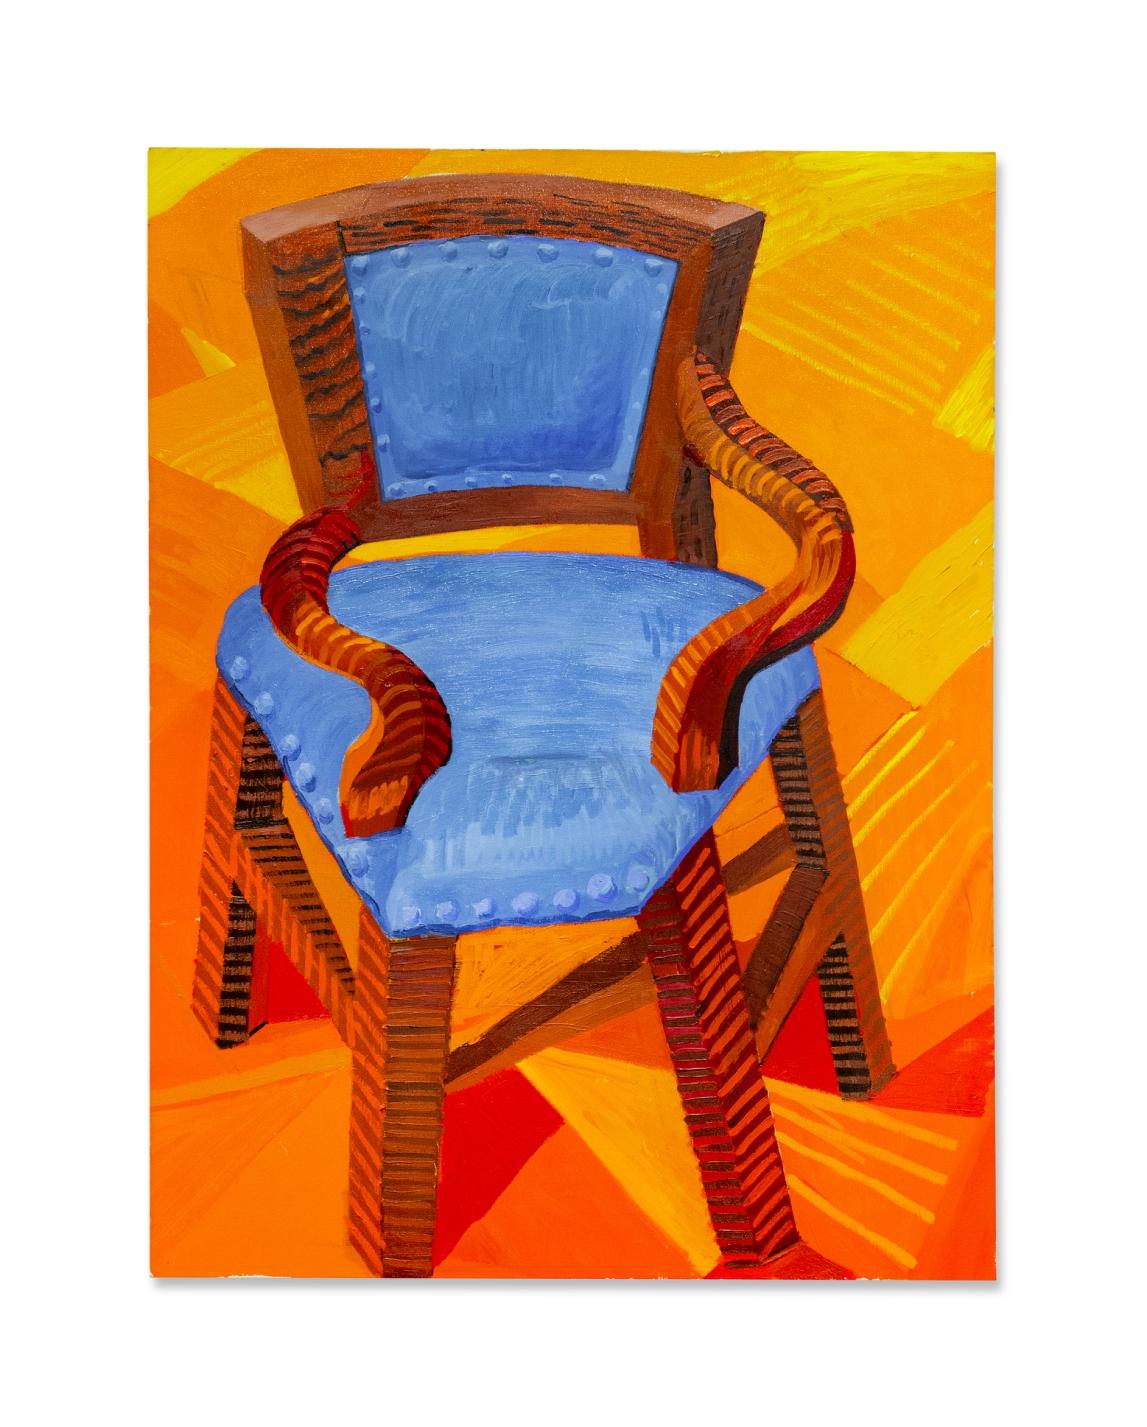 Lot 9 – David Hockney, The Chair.jpg